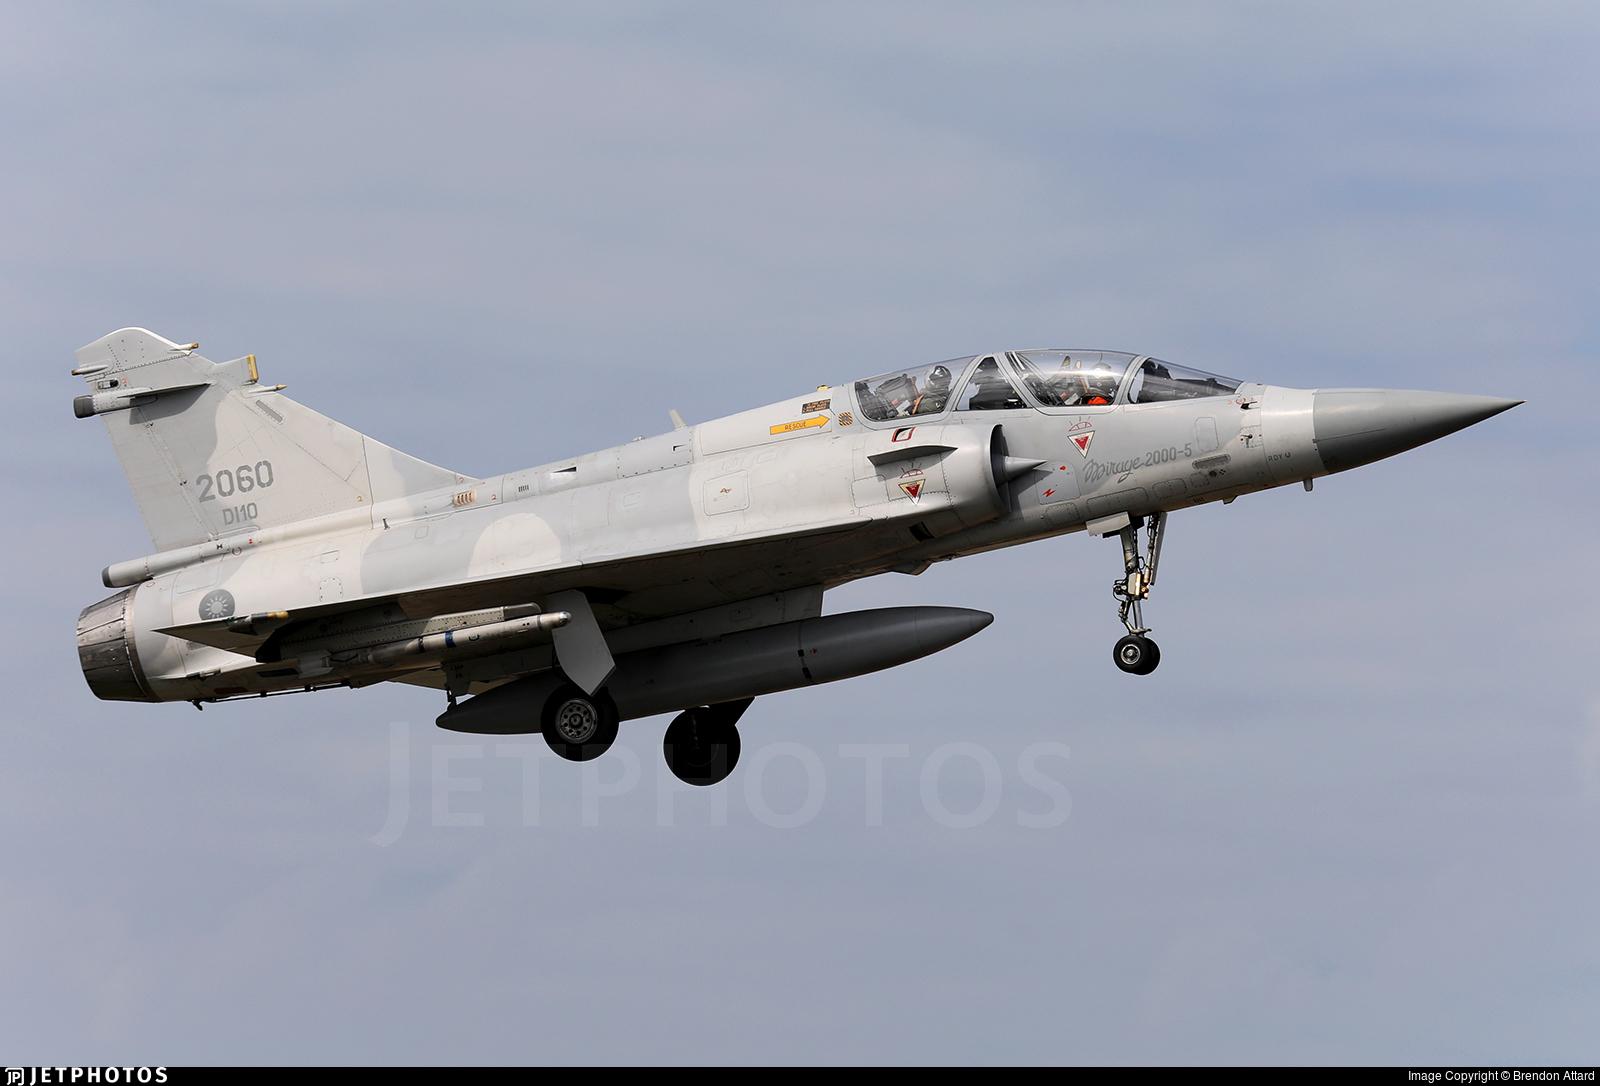 2060 - Dassault Mirage 2000-5DI - Taiwan - Air Force